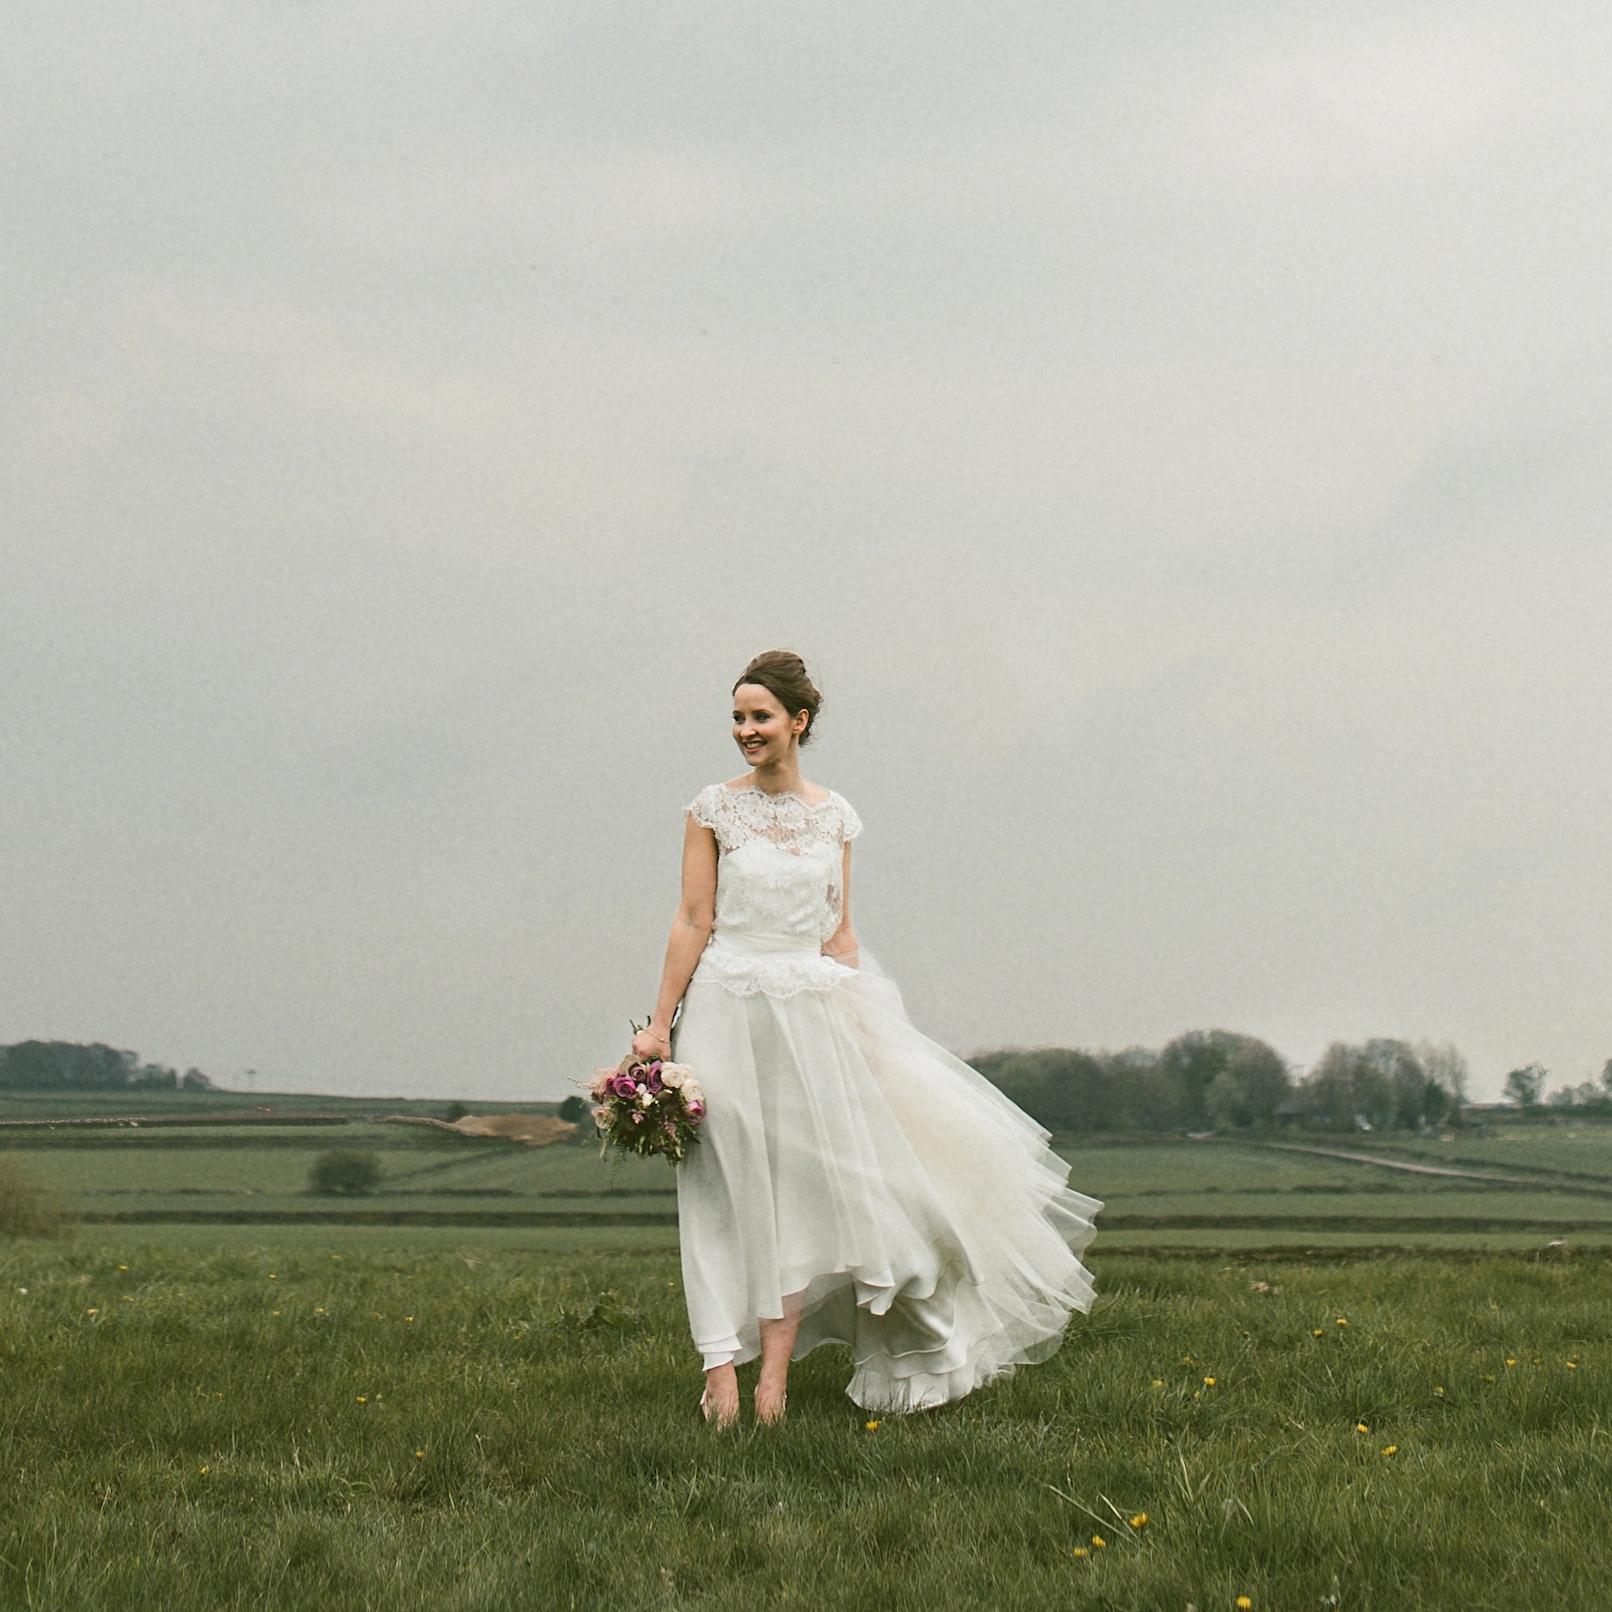 Samantha & James - Whimsical Wonderland Weddings